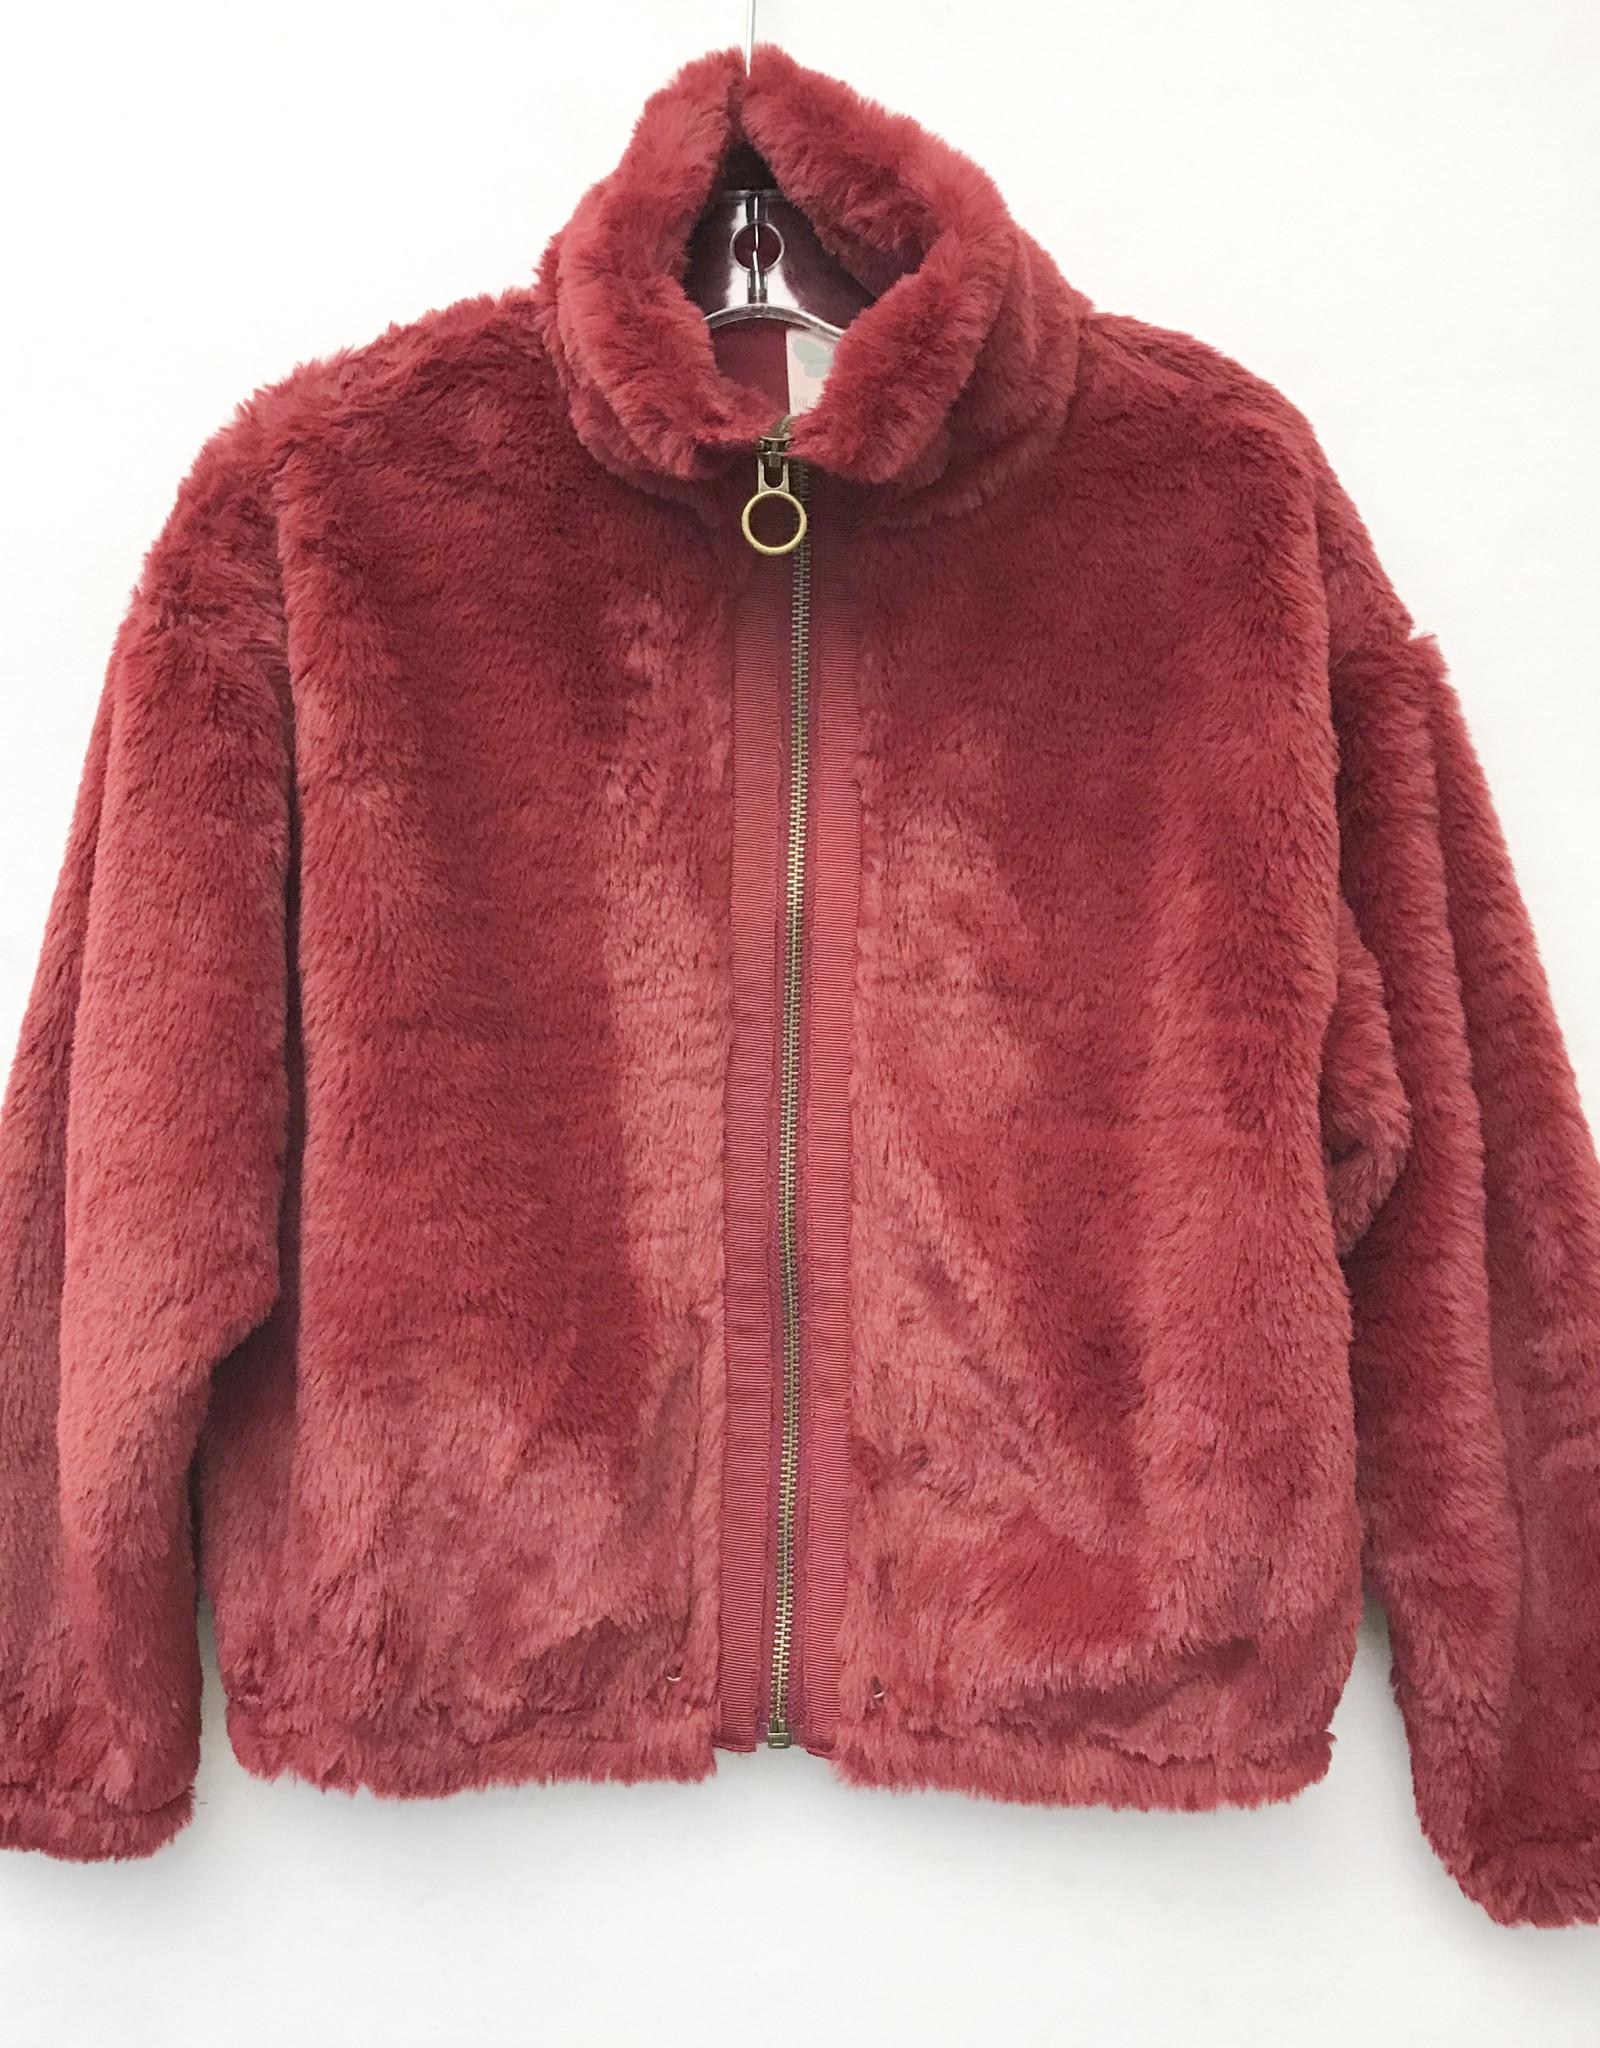 For All Seasons Faux Fur Jacket - Burgundy